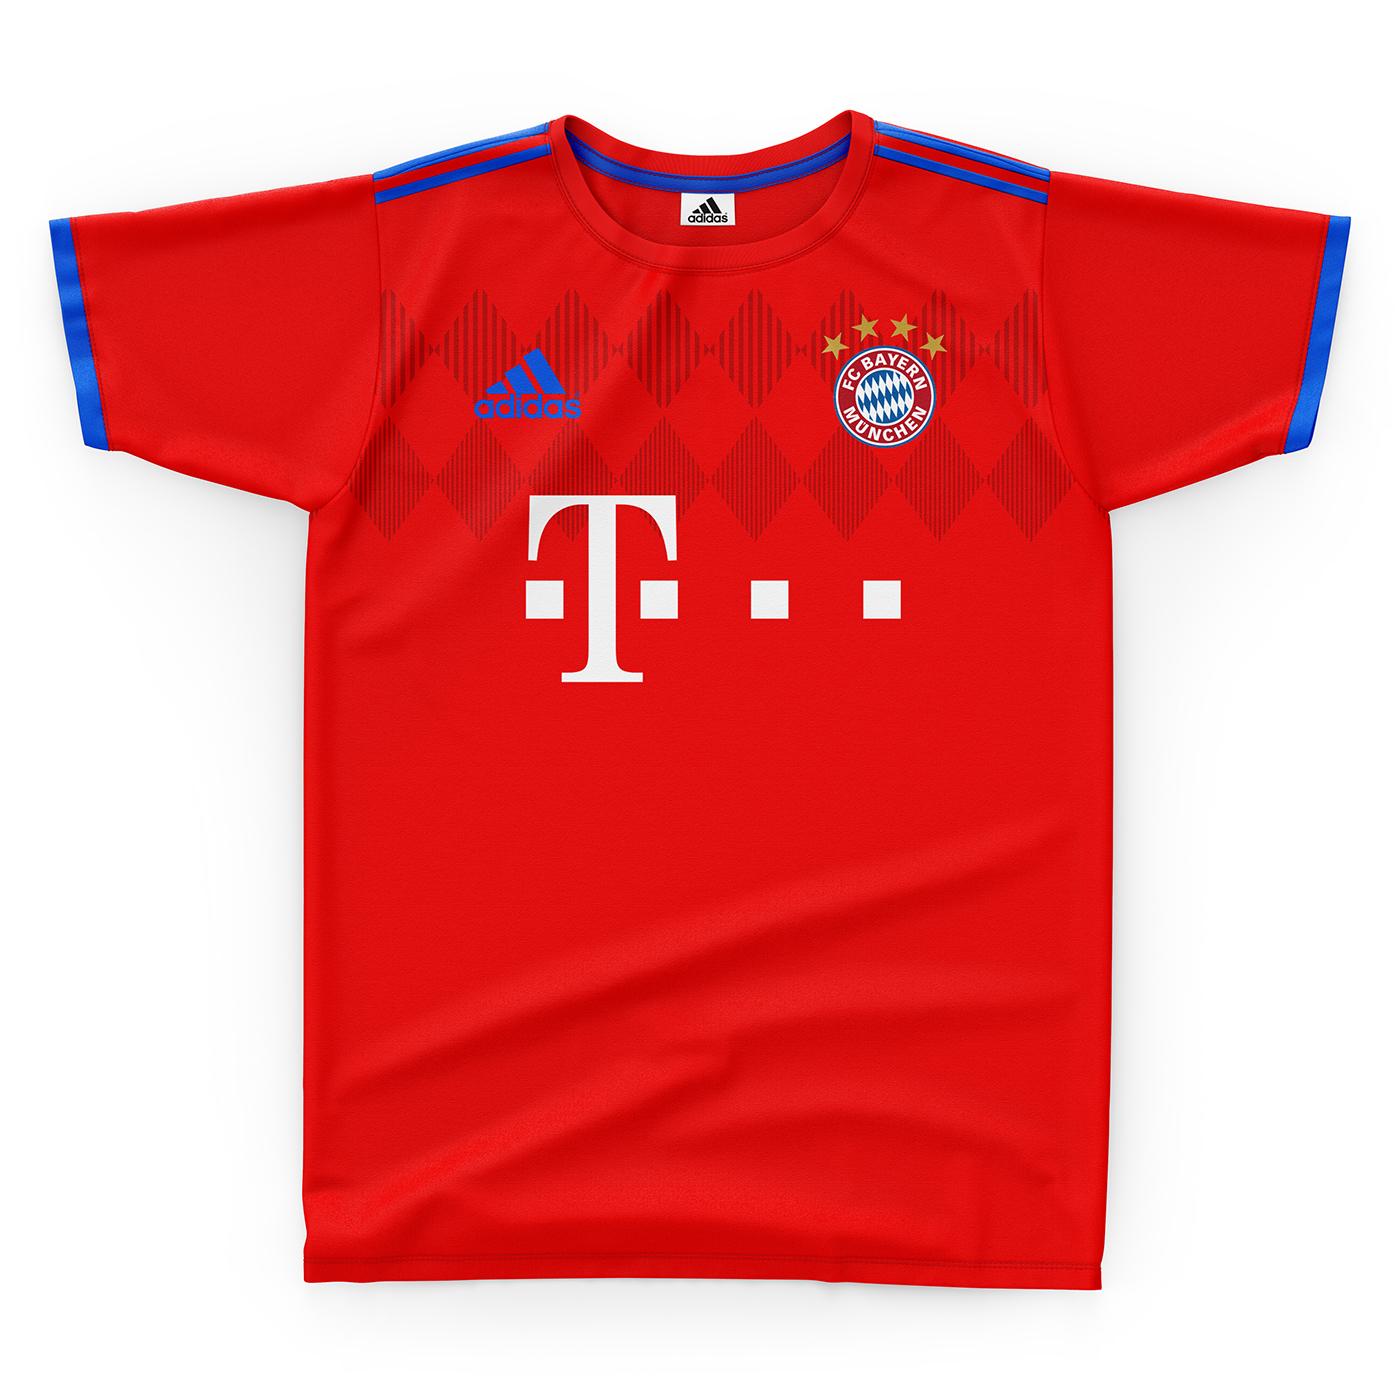 Fc Bayern Munchen Football Kit 18/19  on Behance